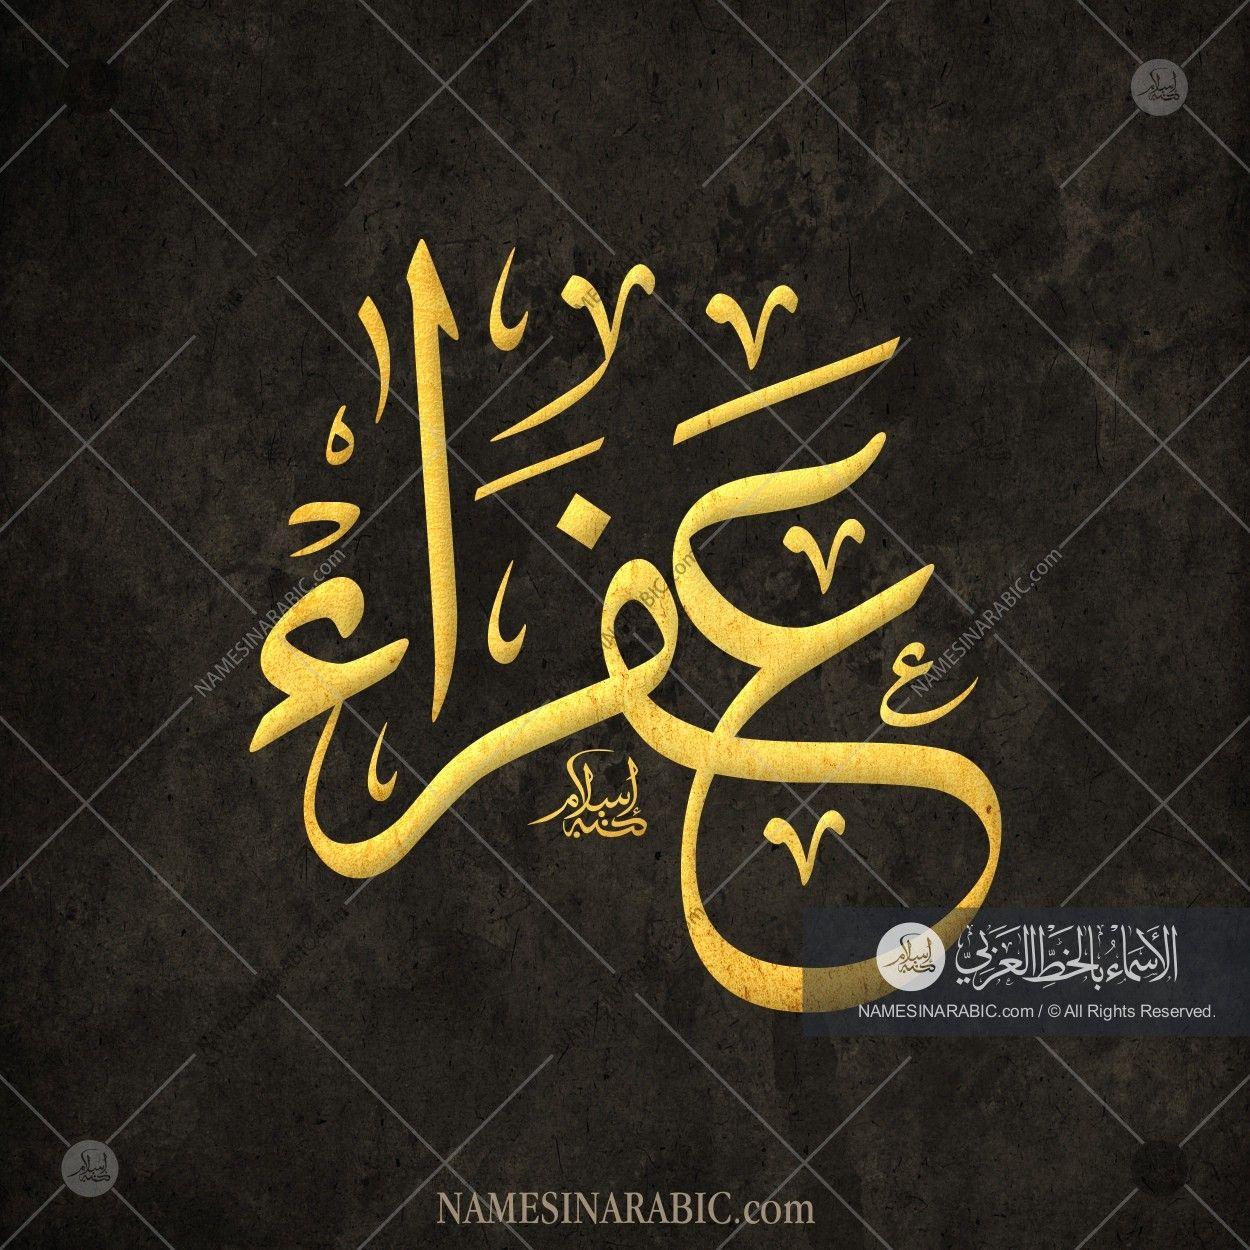 Afraa عفراء Names In Arabic Calligraphy Name 3224 Arabic Calligraphy Name Calligraphy